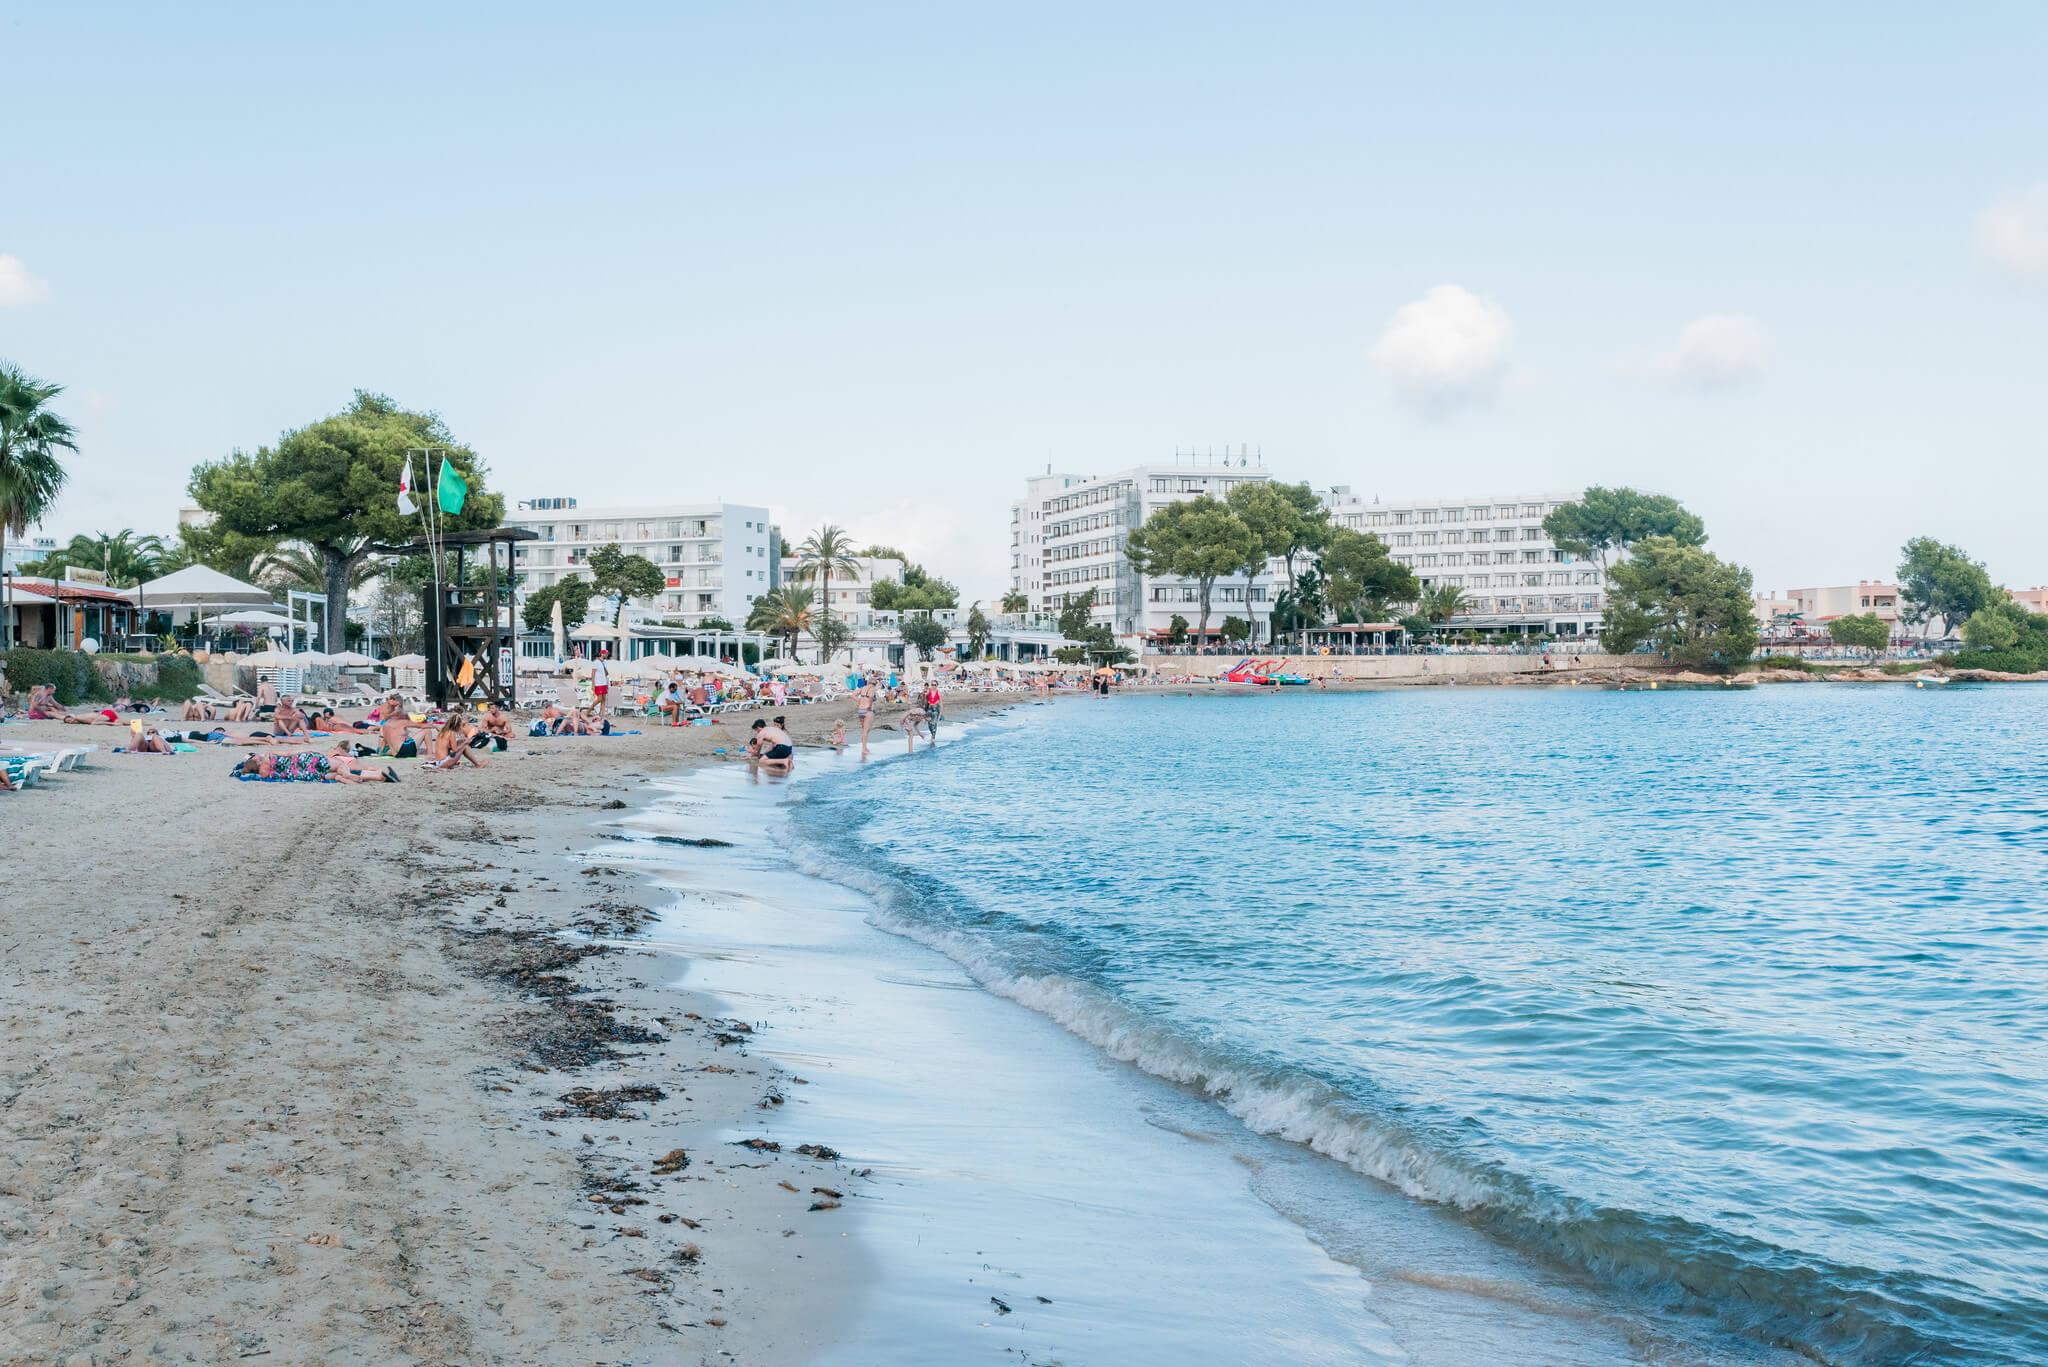 https://www.white-ibiza.com/wp-content/uploads/2020/03/ibiza-beaches-cala-llonga-04.jpg